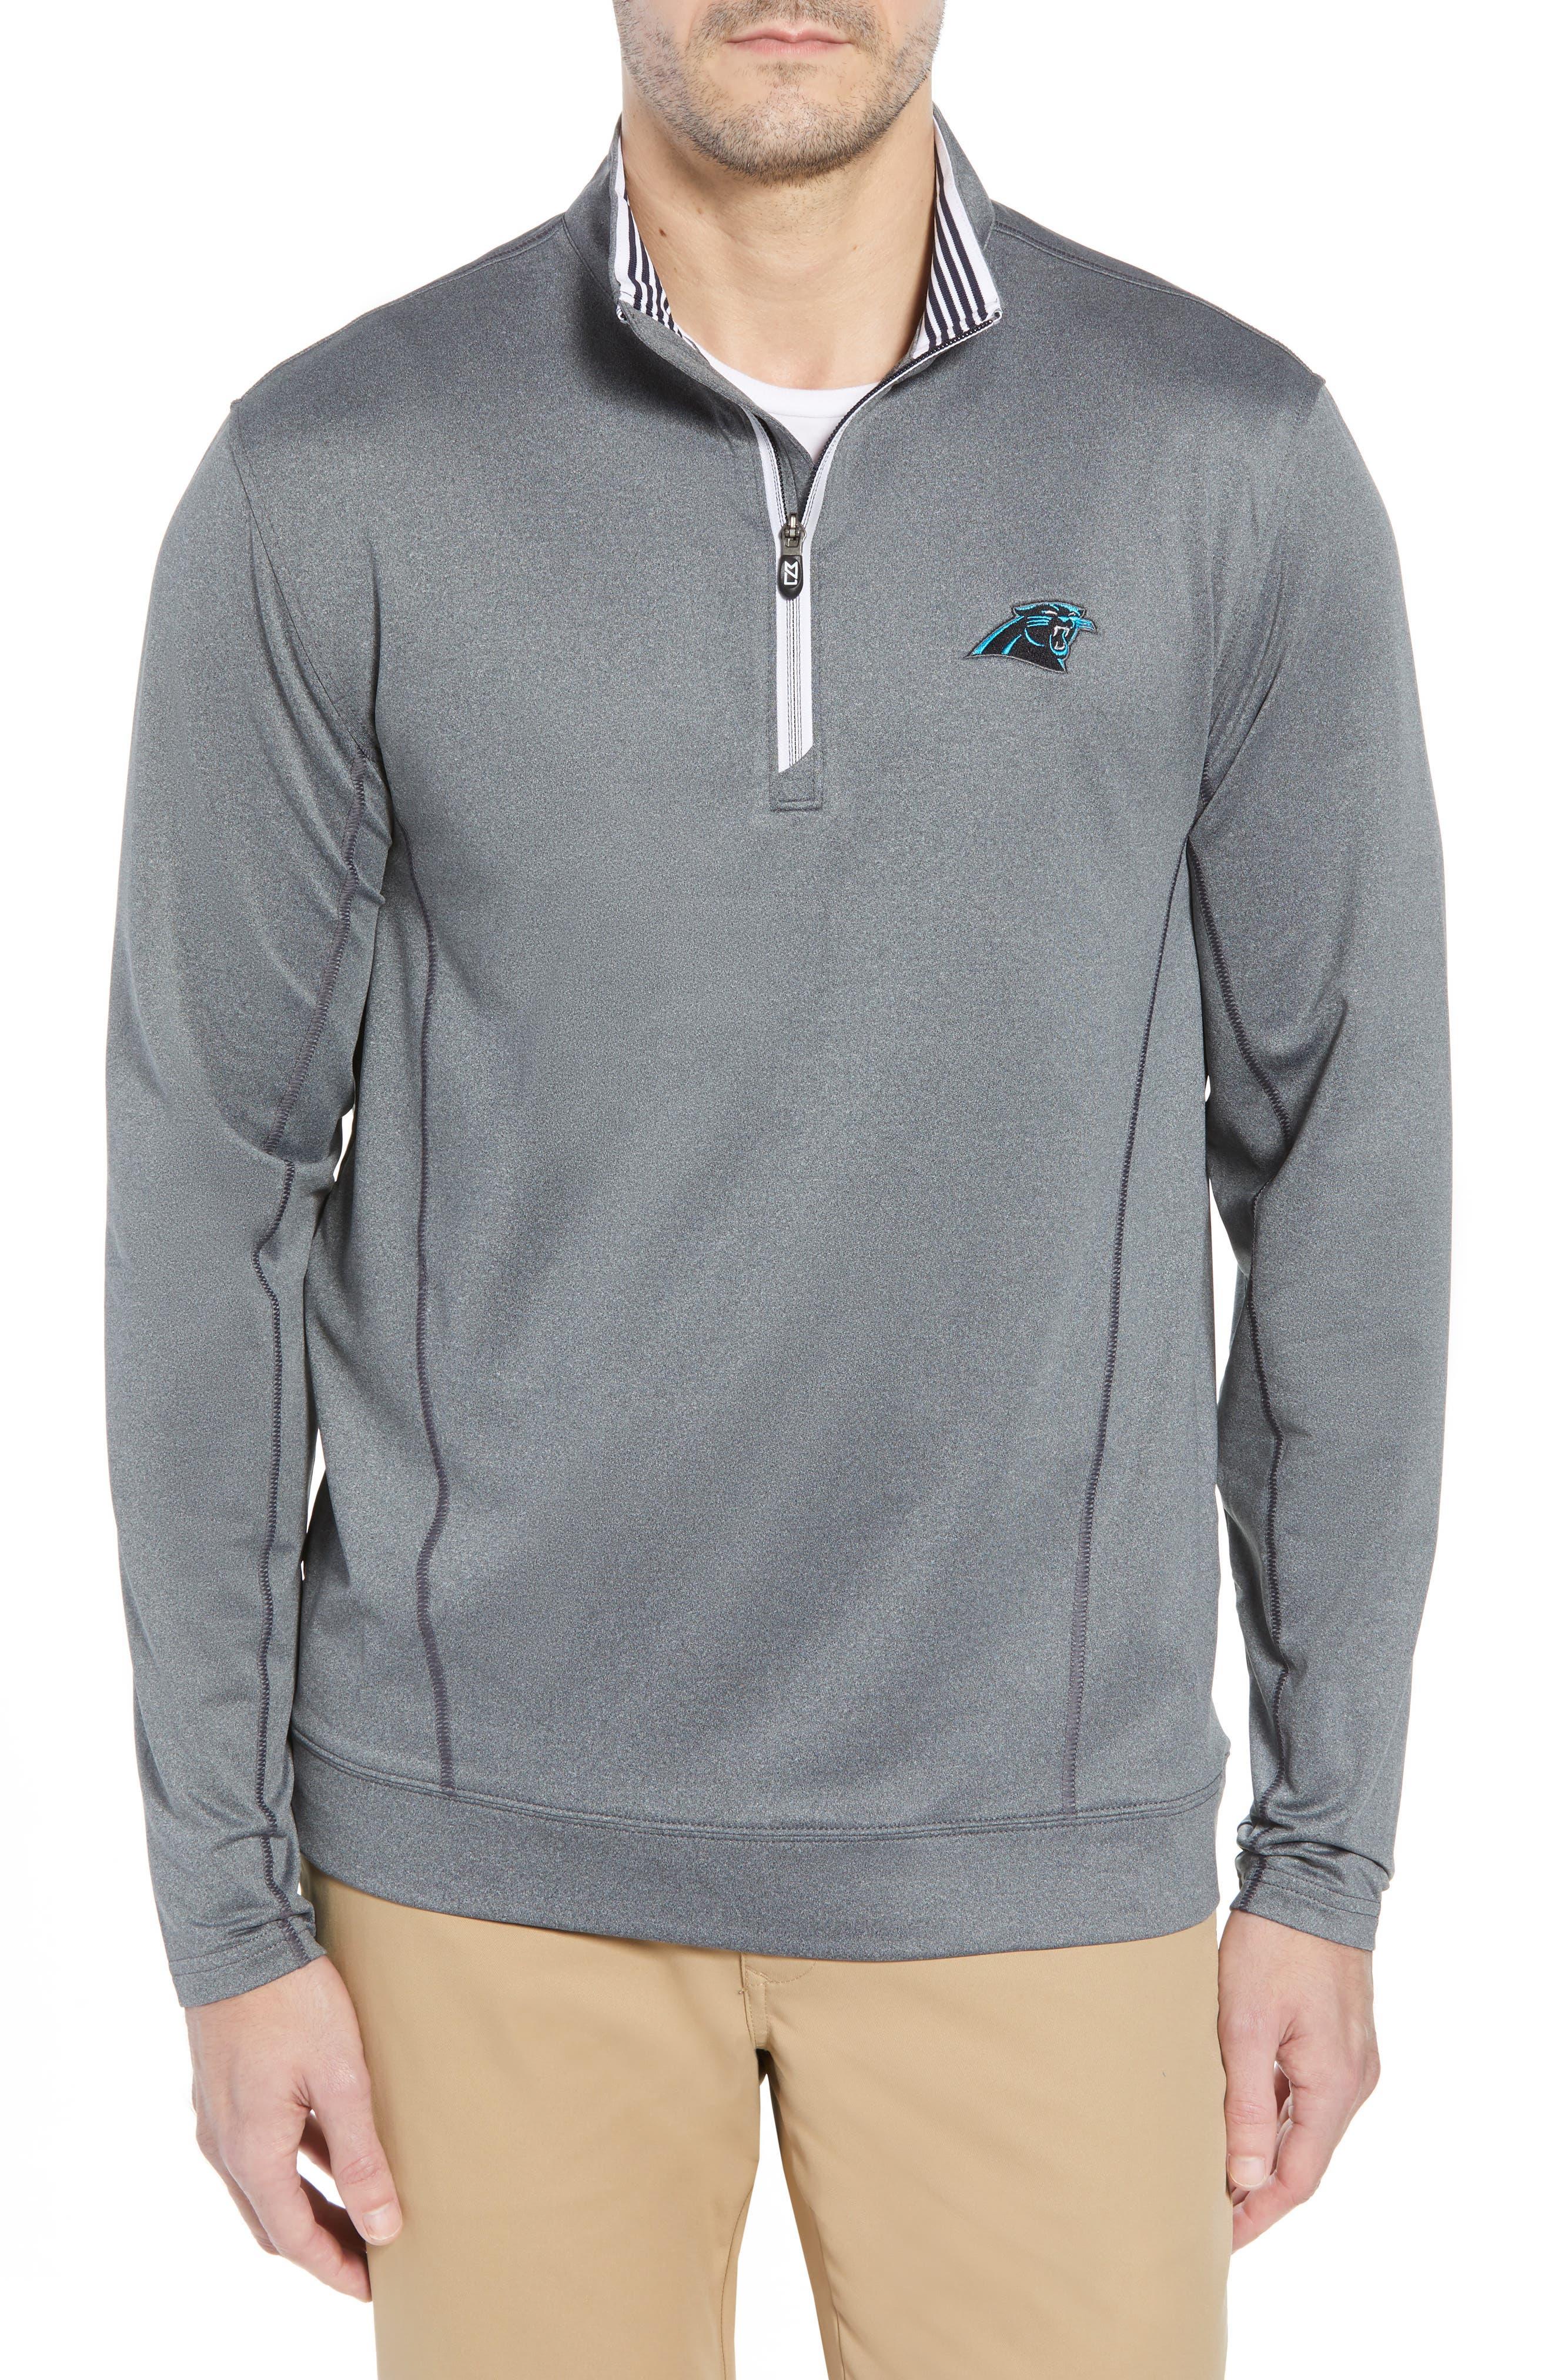 Endurance Carolina Panthers Regular Fit Pullover,                         Main,                         color, CHARCOAL HEATHER